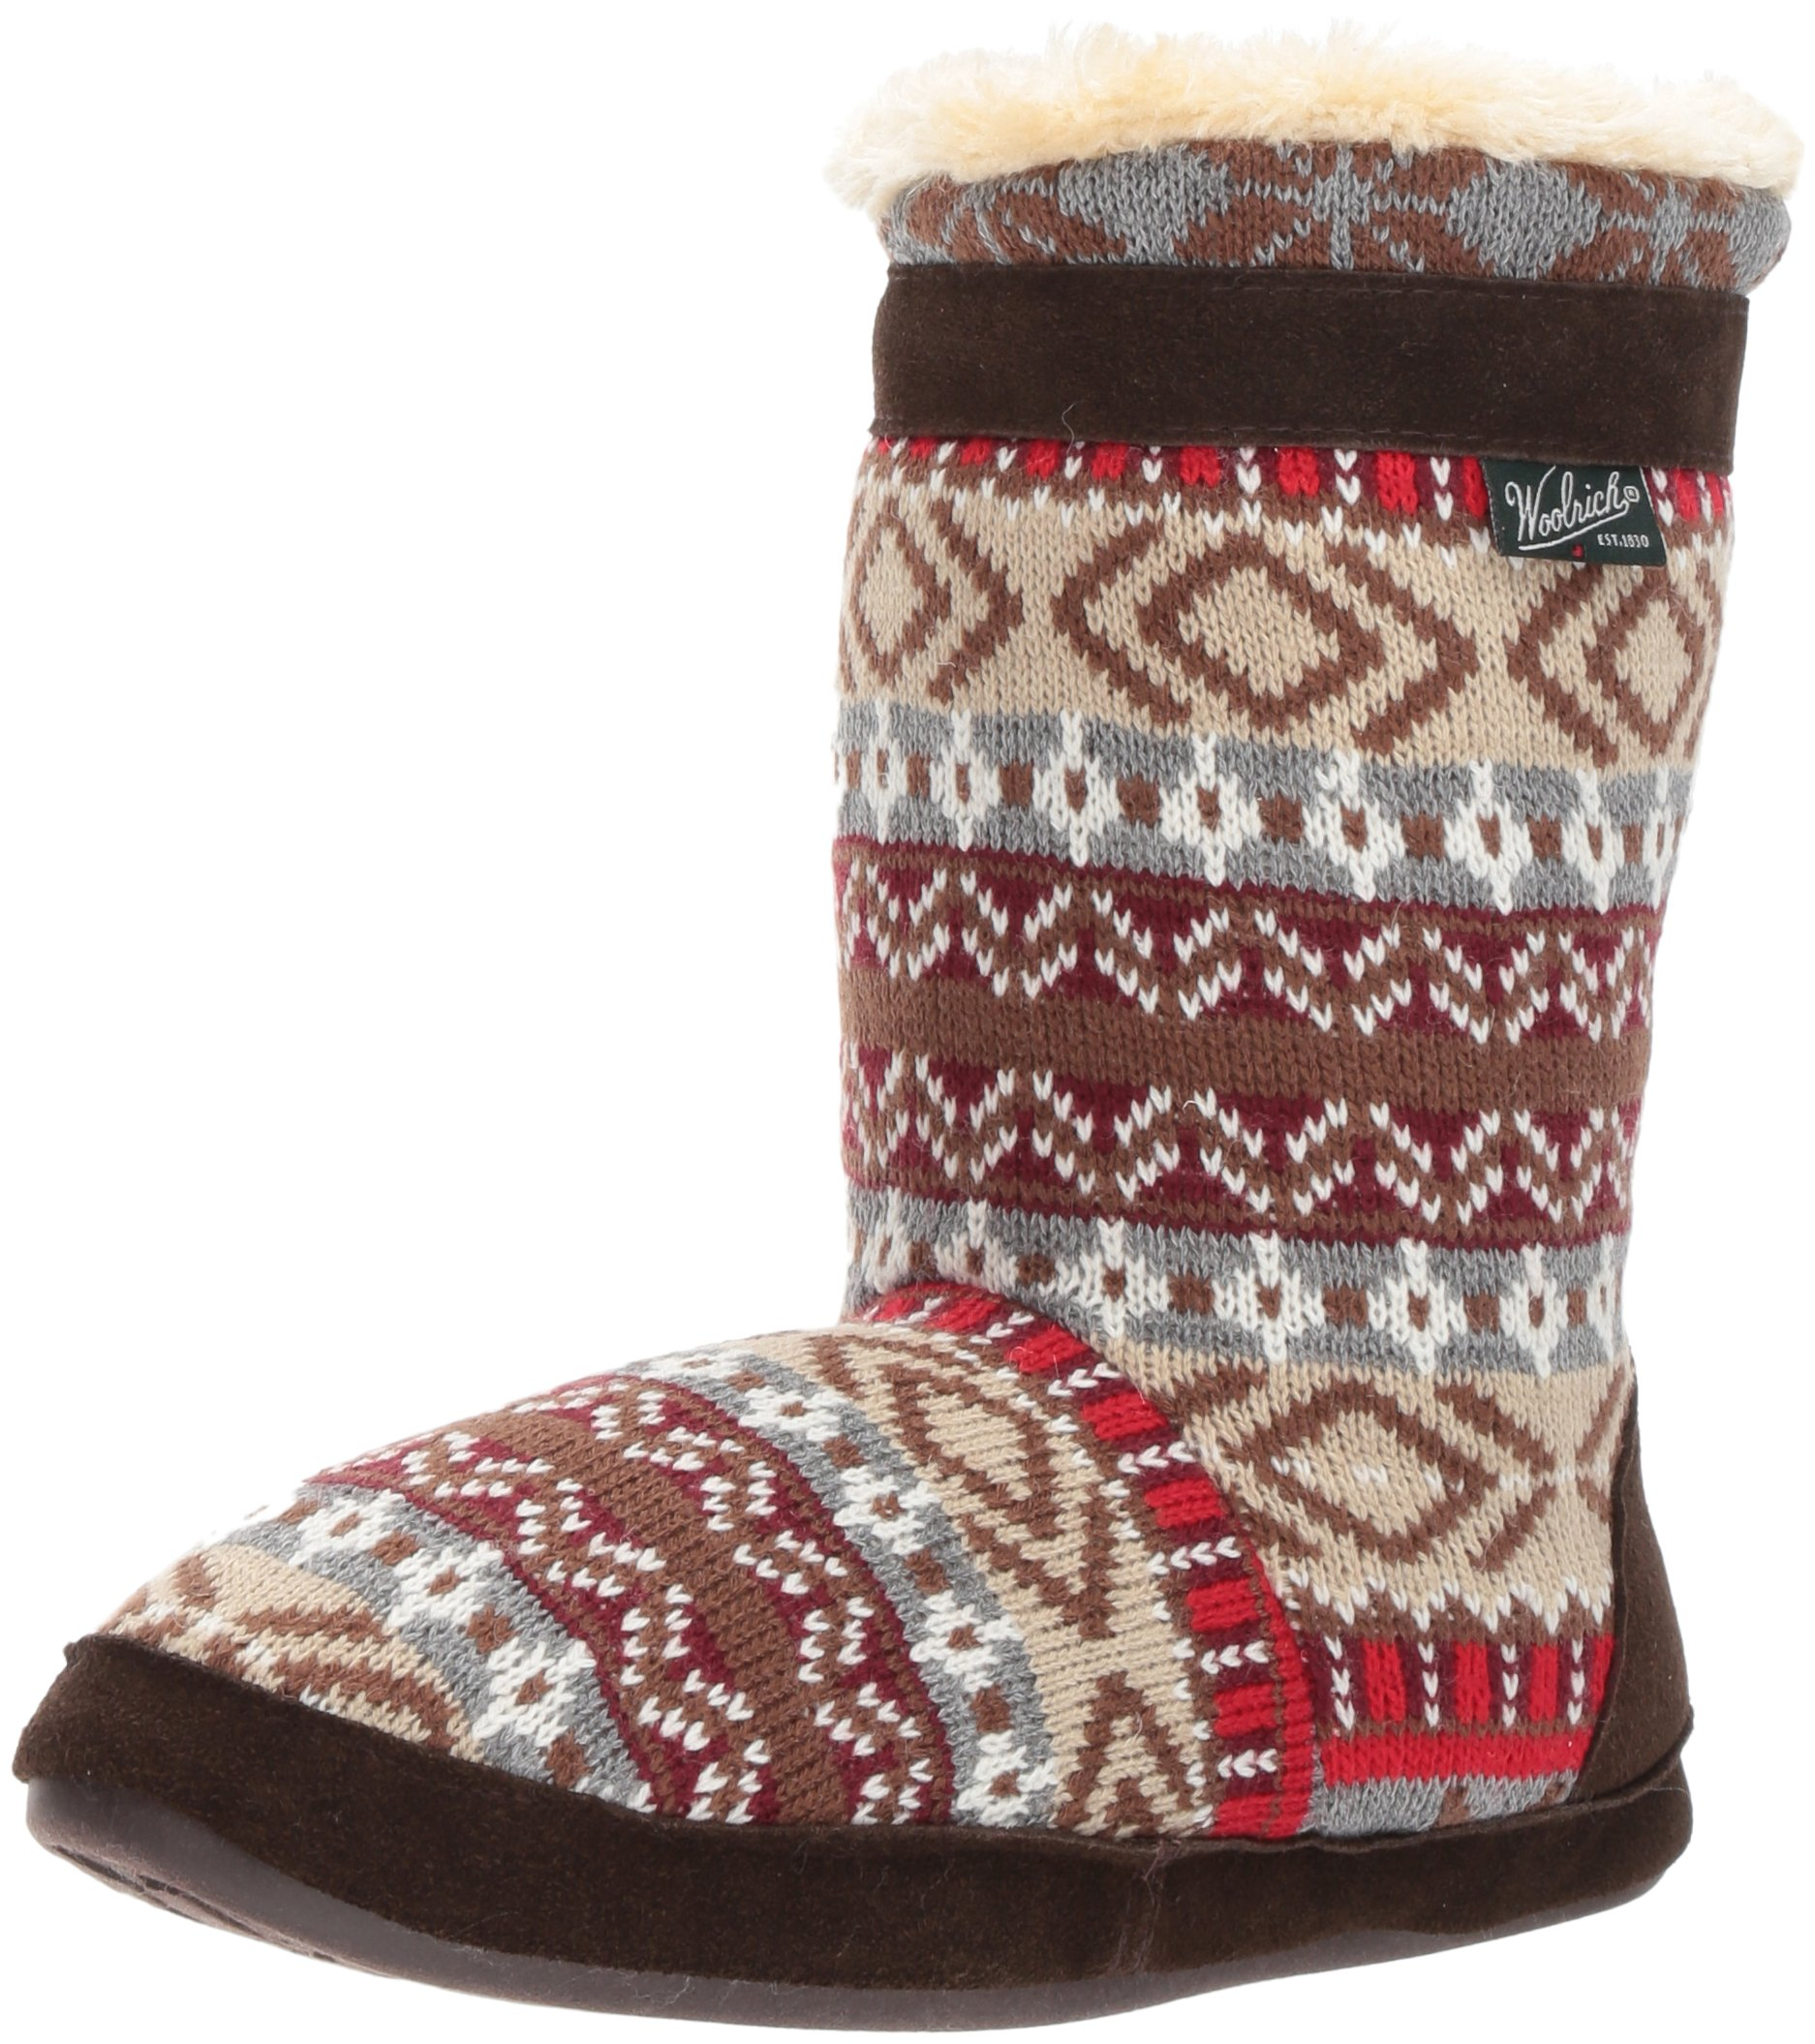 Woolrich Women's Whitecap Knit Boot Slipper, Kendall Creek, 7 M US